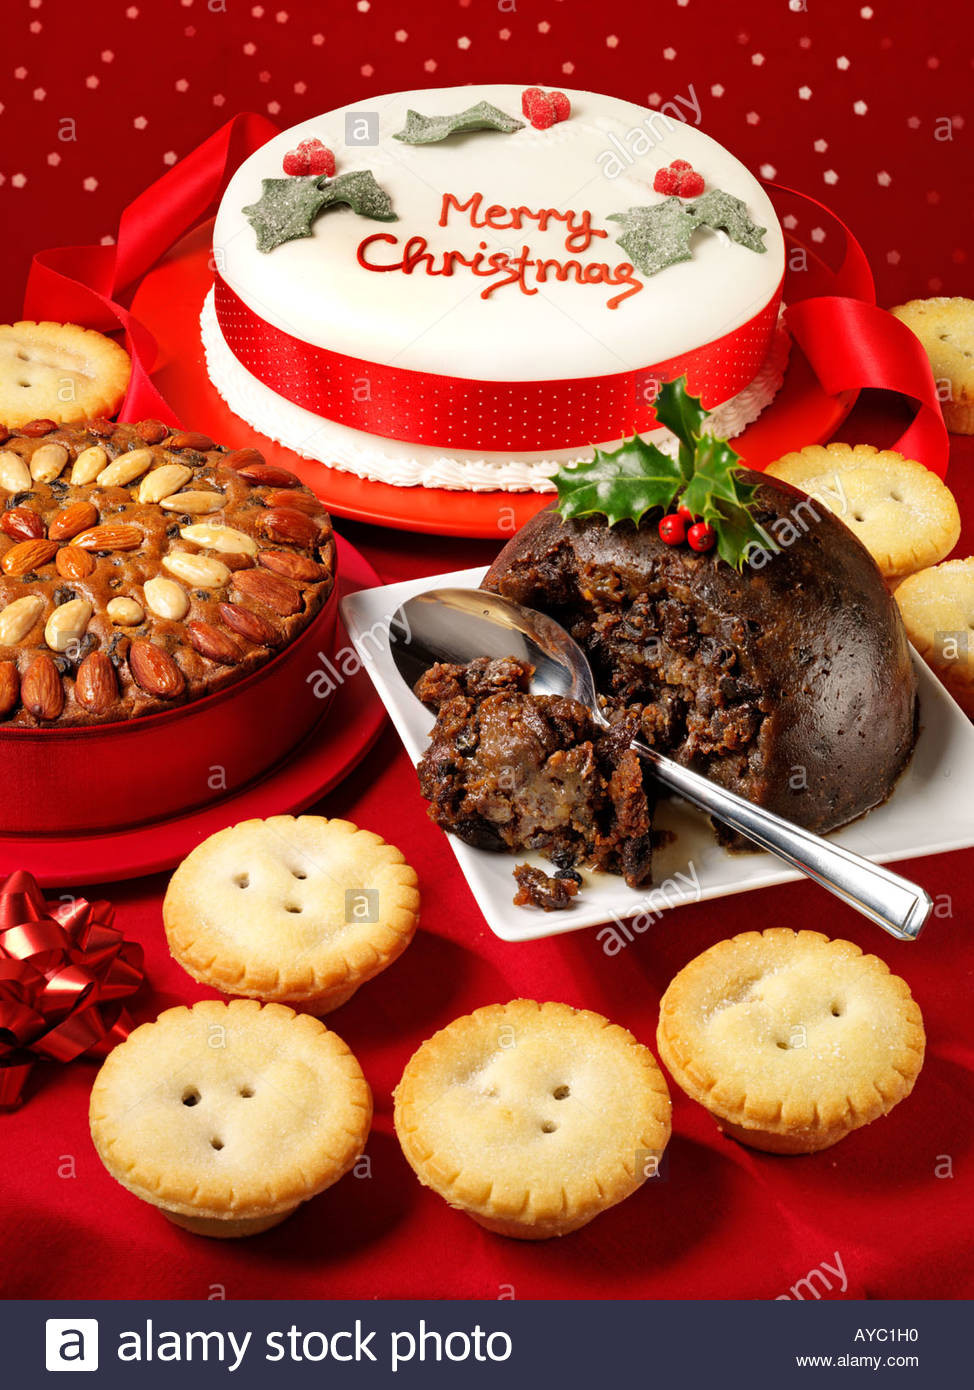 English Christmas Desserts  BRITISH CHRISTMAS DESSERTS Stock Royalty Free Image